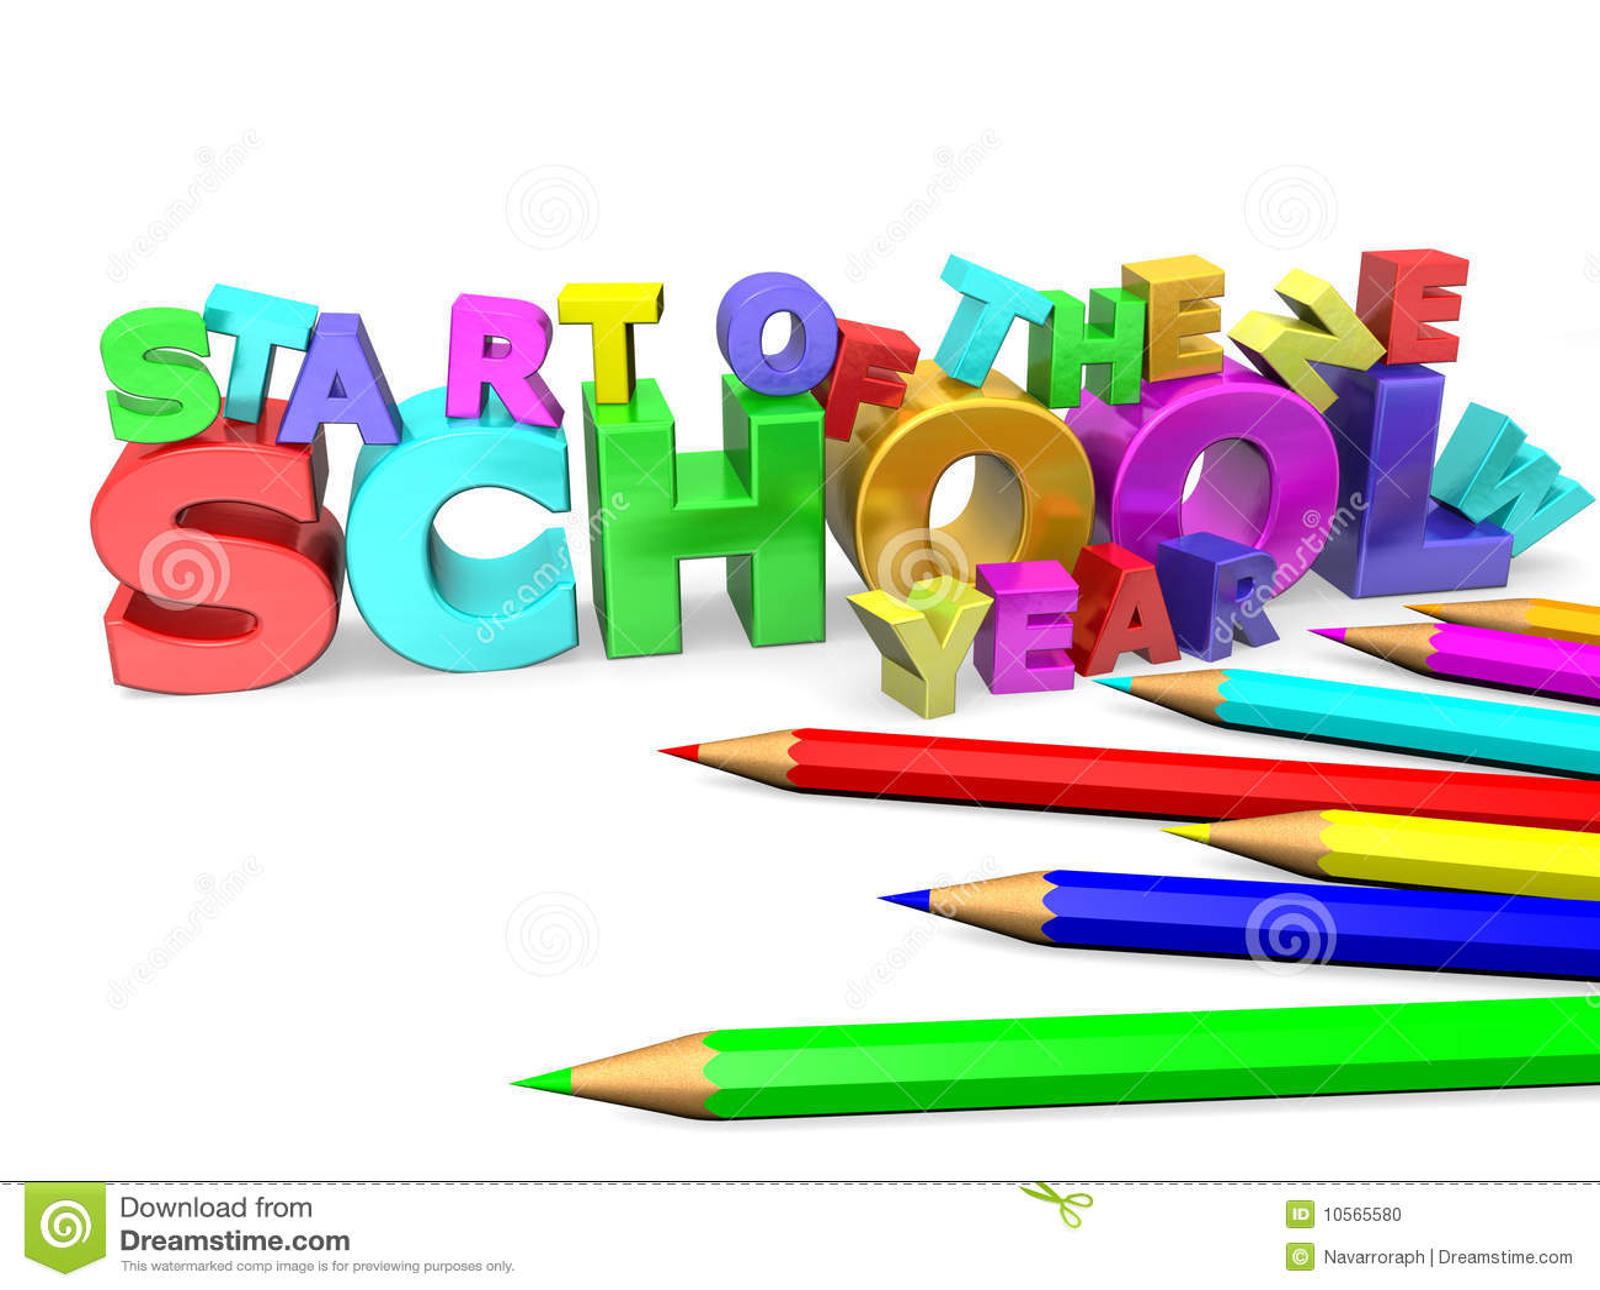 clipart school starts-#50